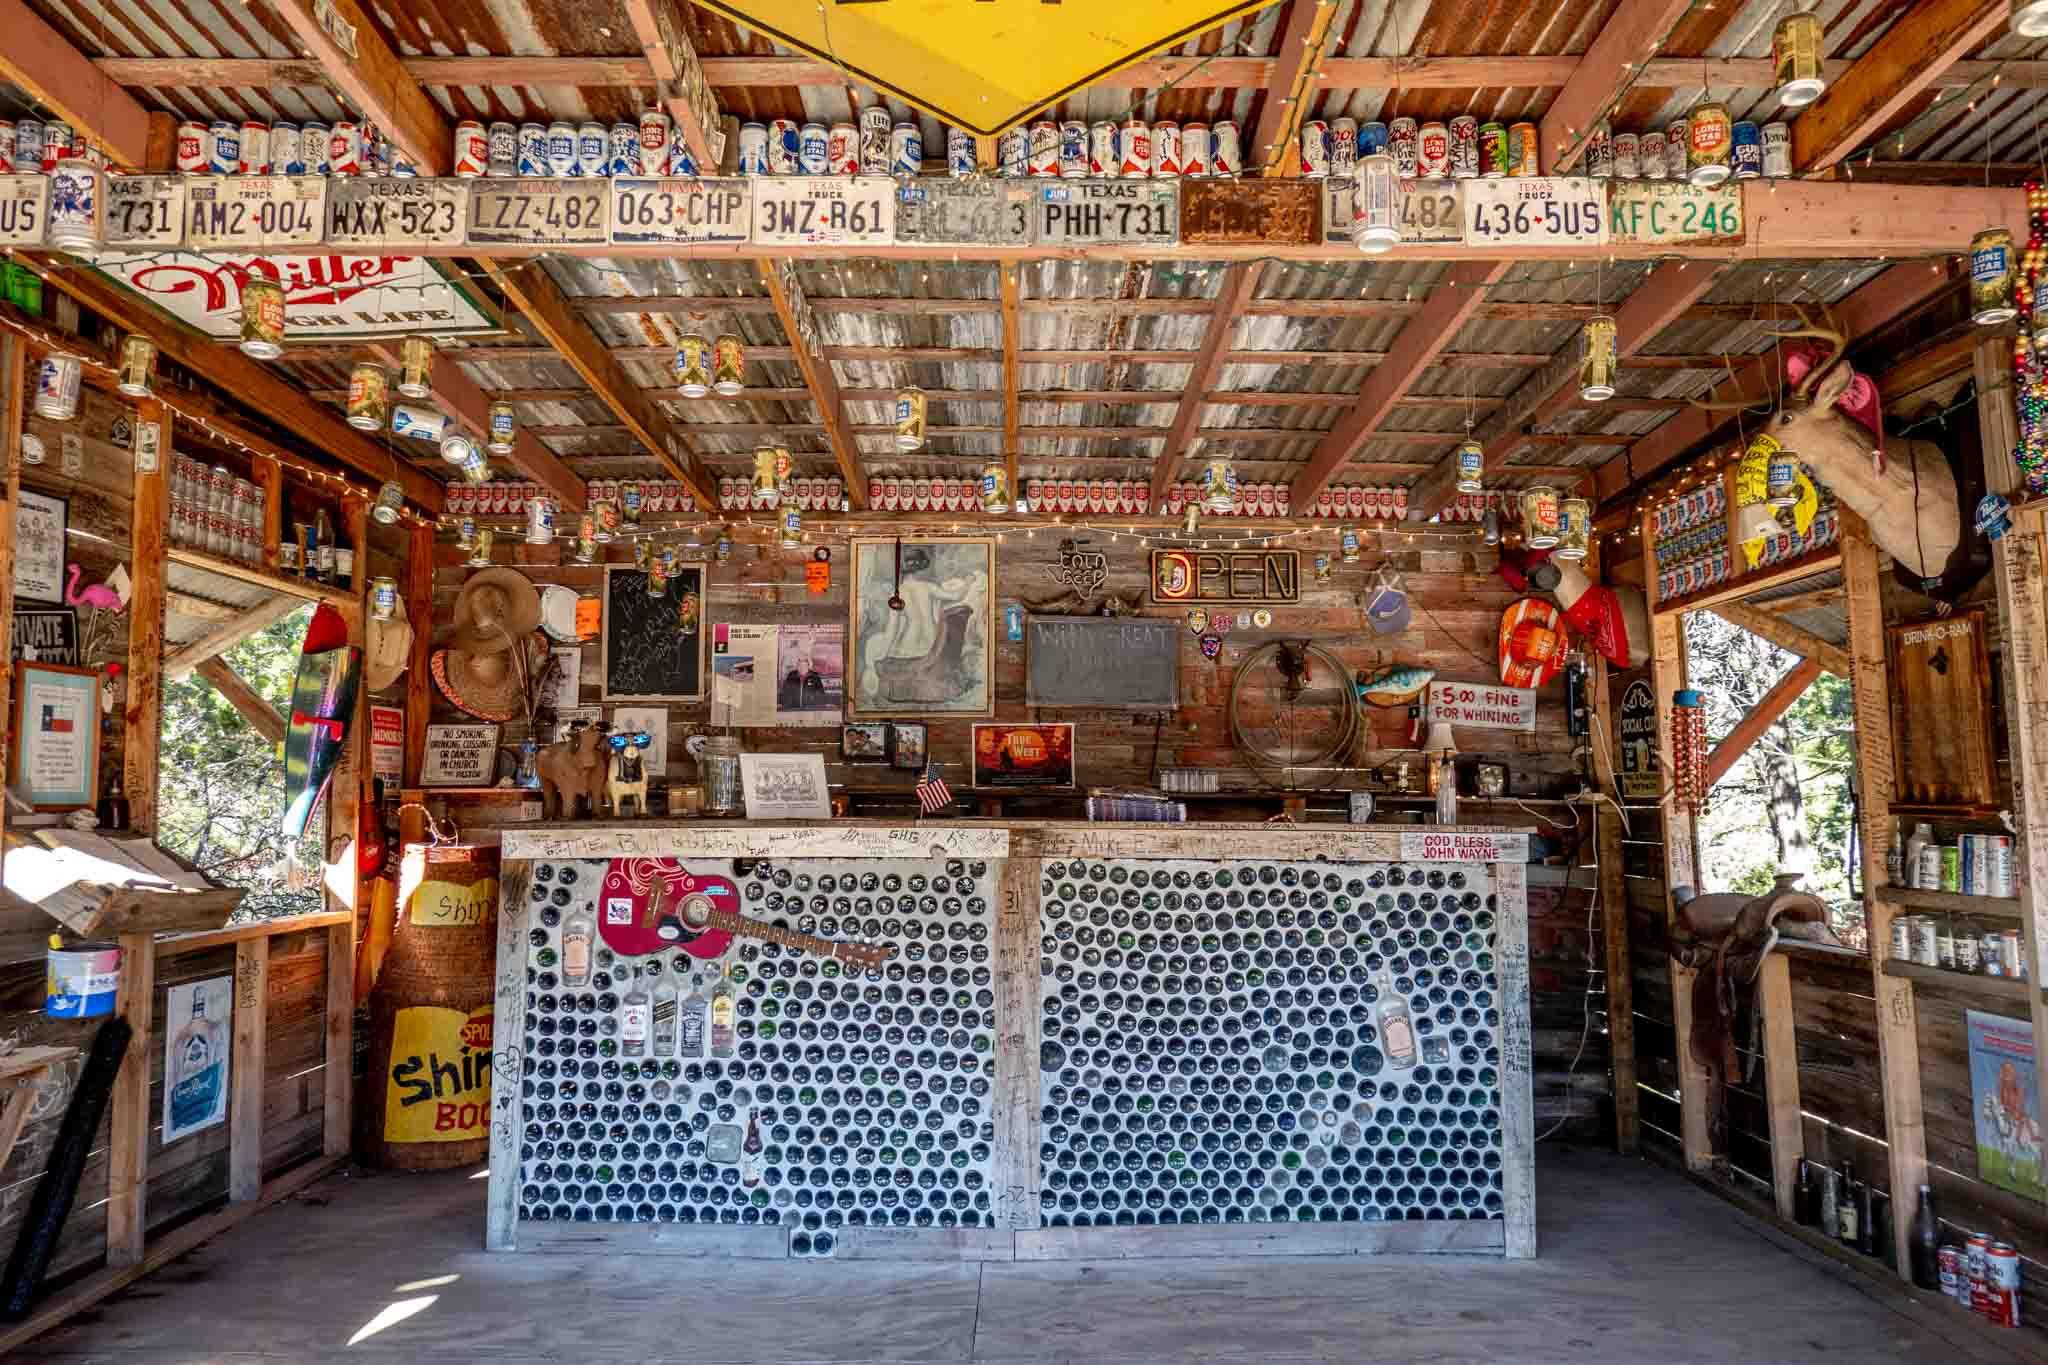 Kitschy interior of the roadside saloon